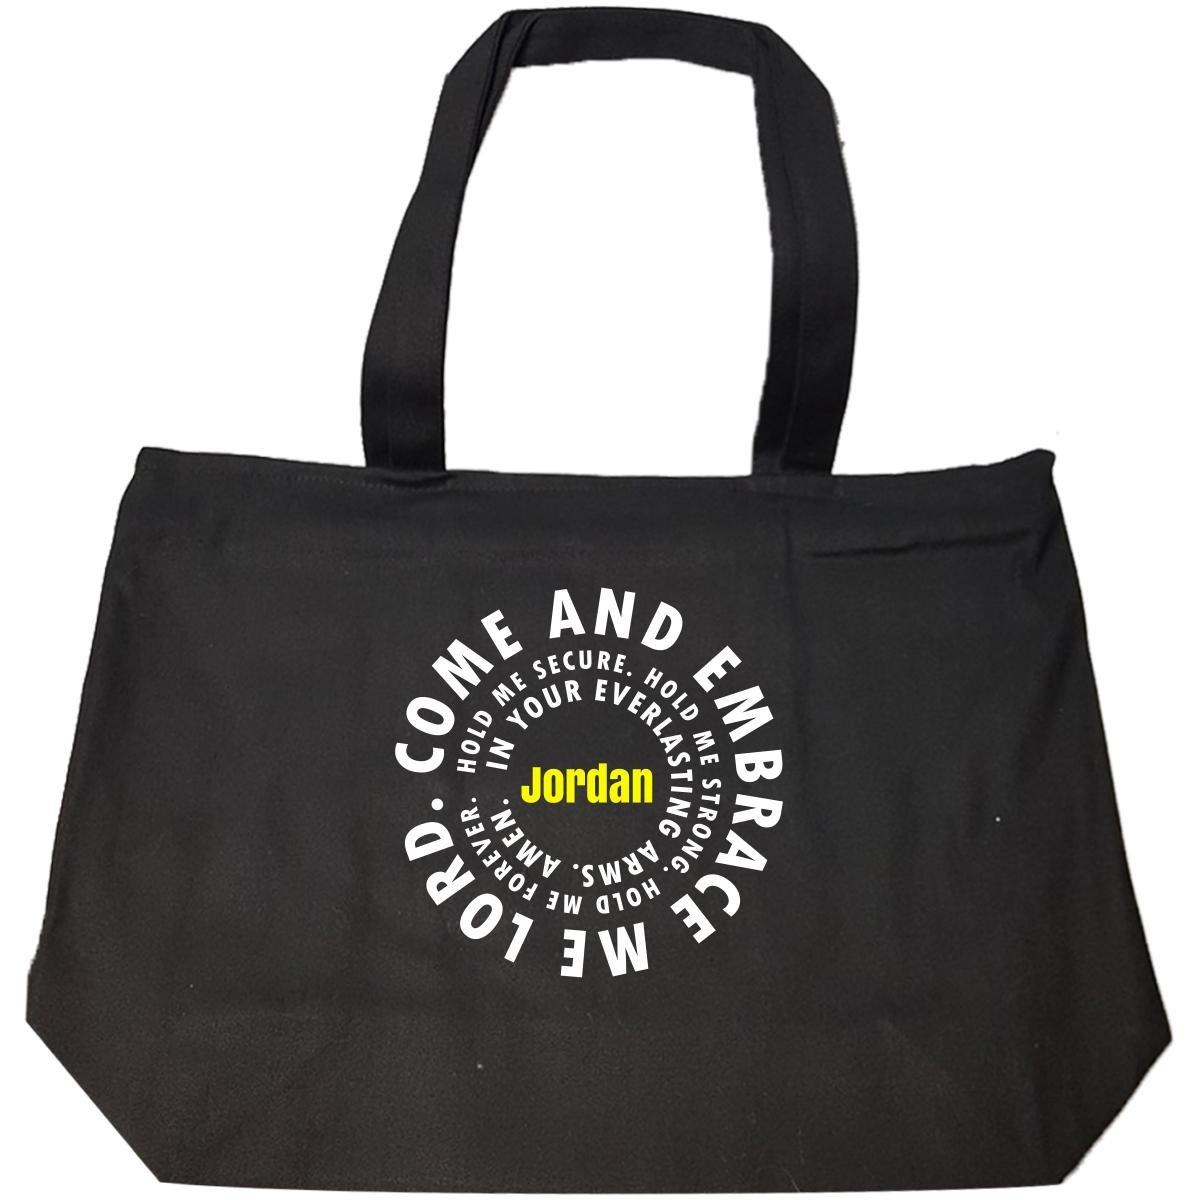 Jordan Prayer Catholic Christian God Religious - Tote Bag With Zip